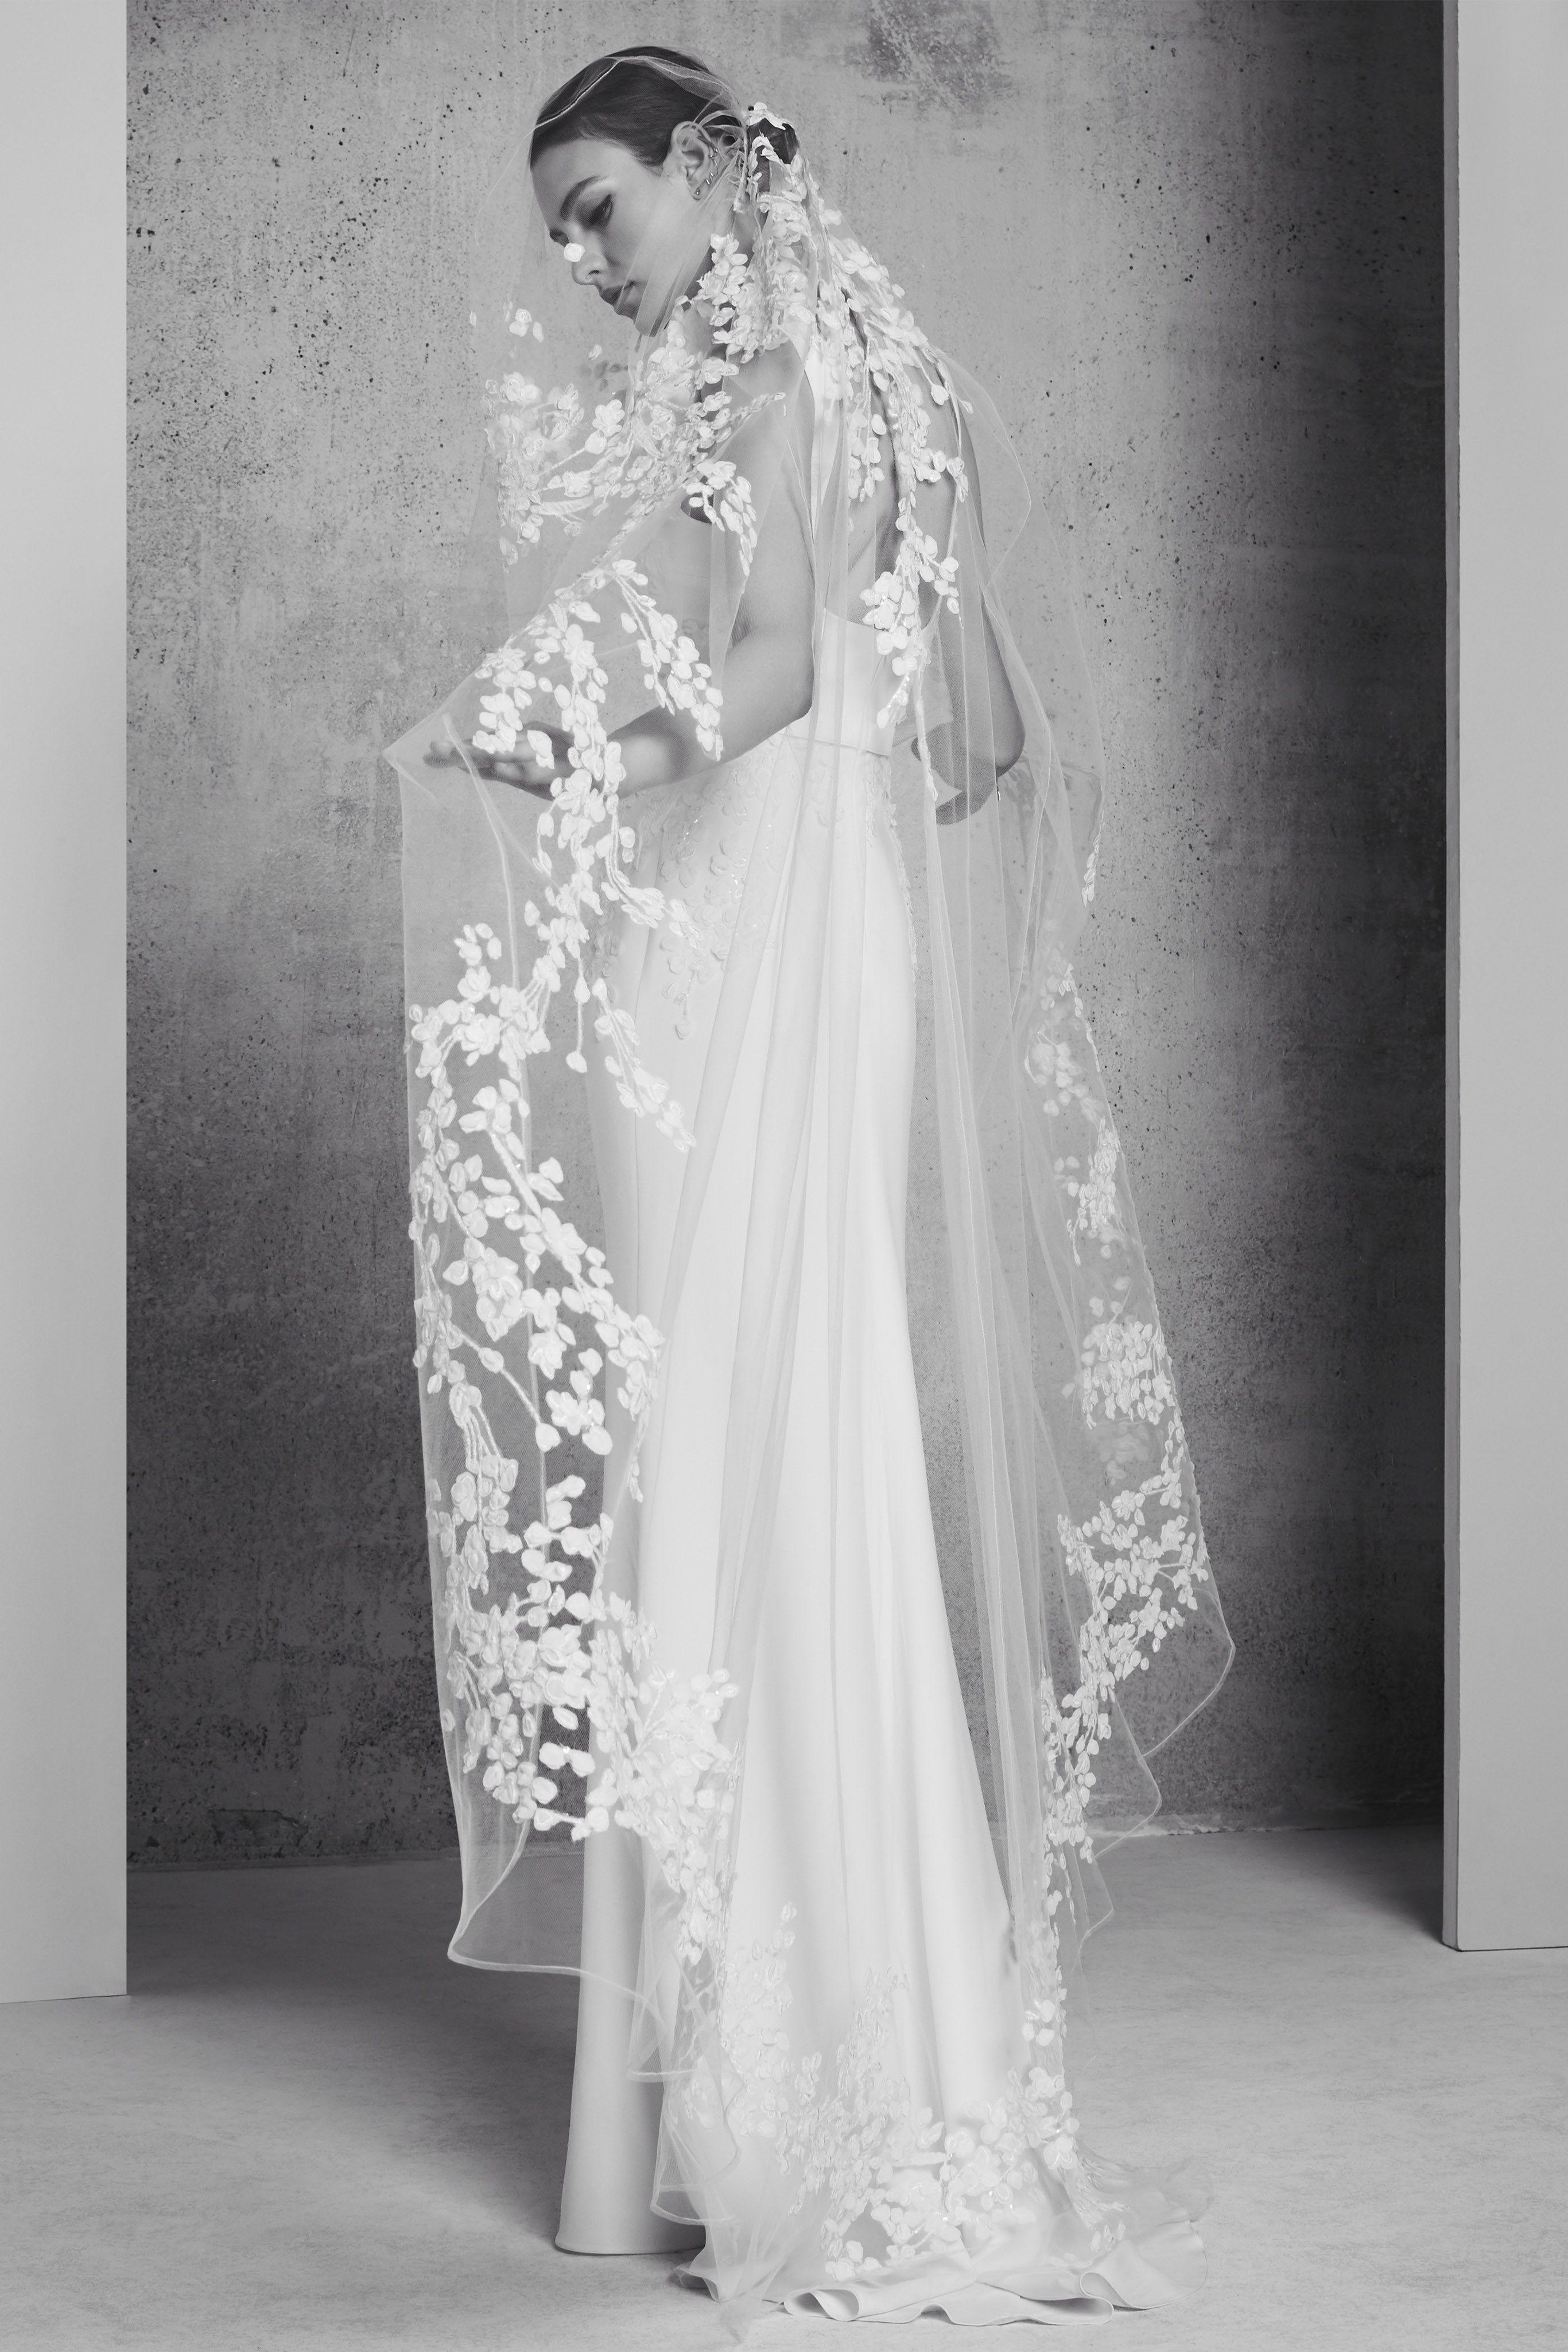 Elie saab satin sheath dress with long flowerembellished veil